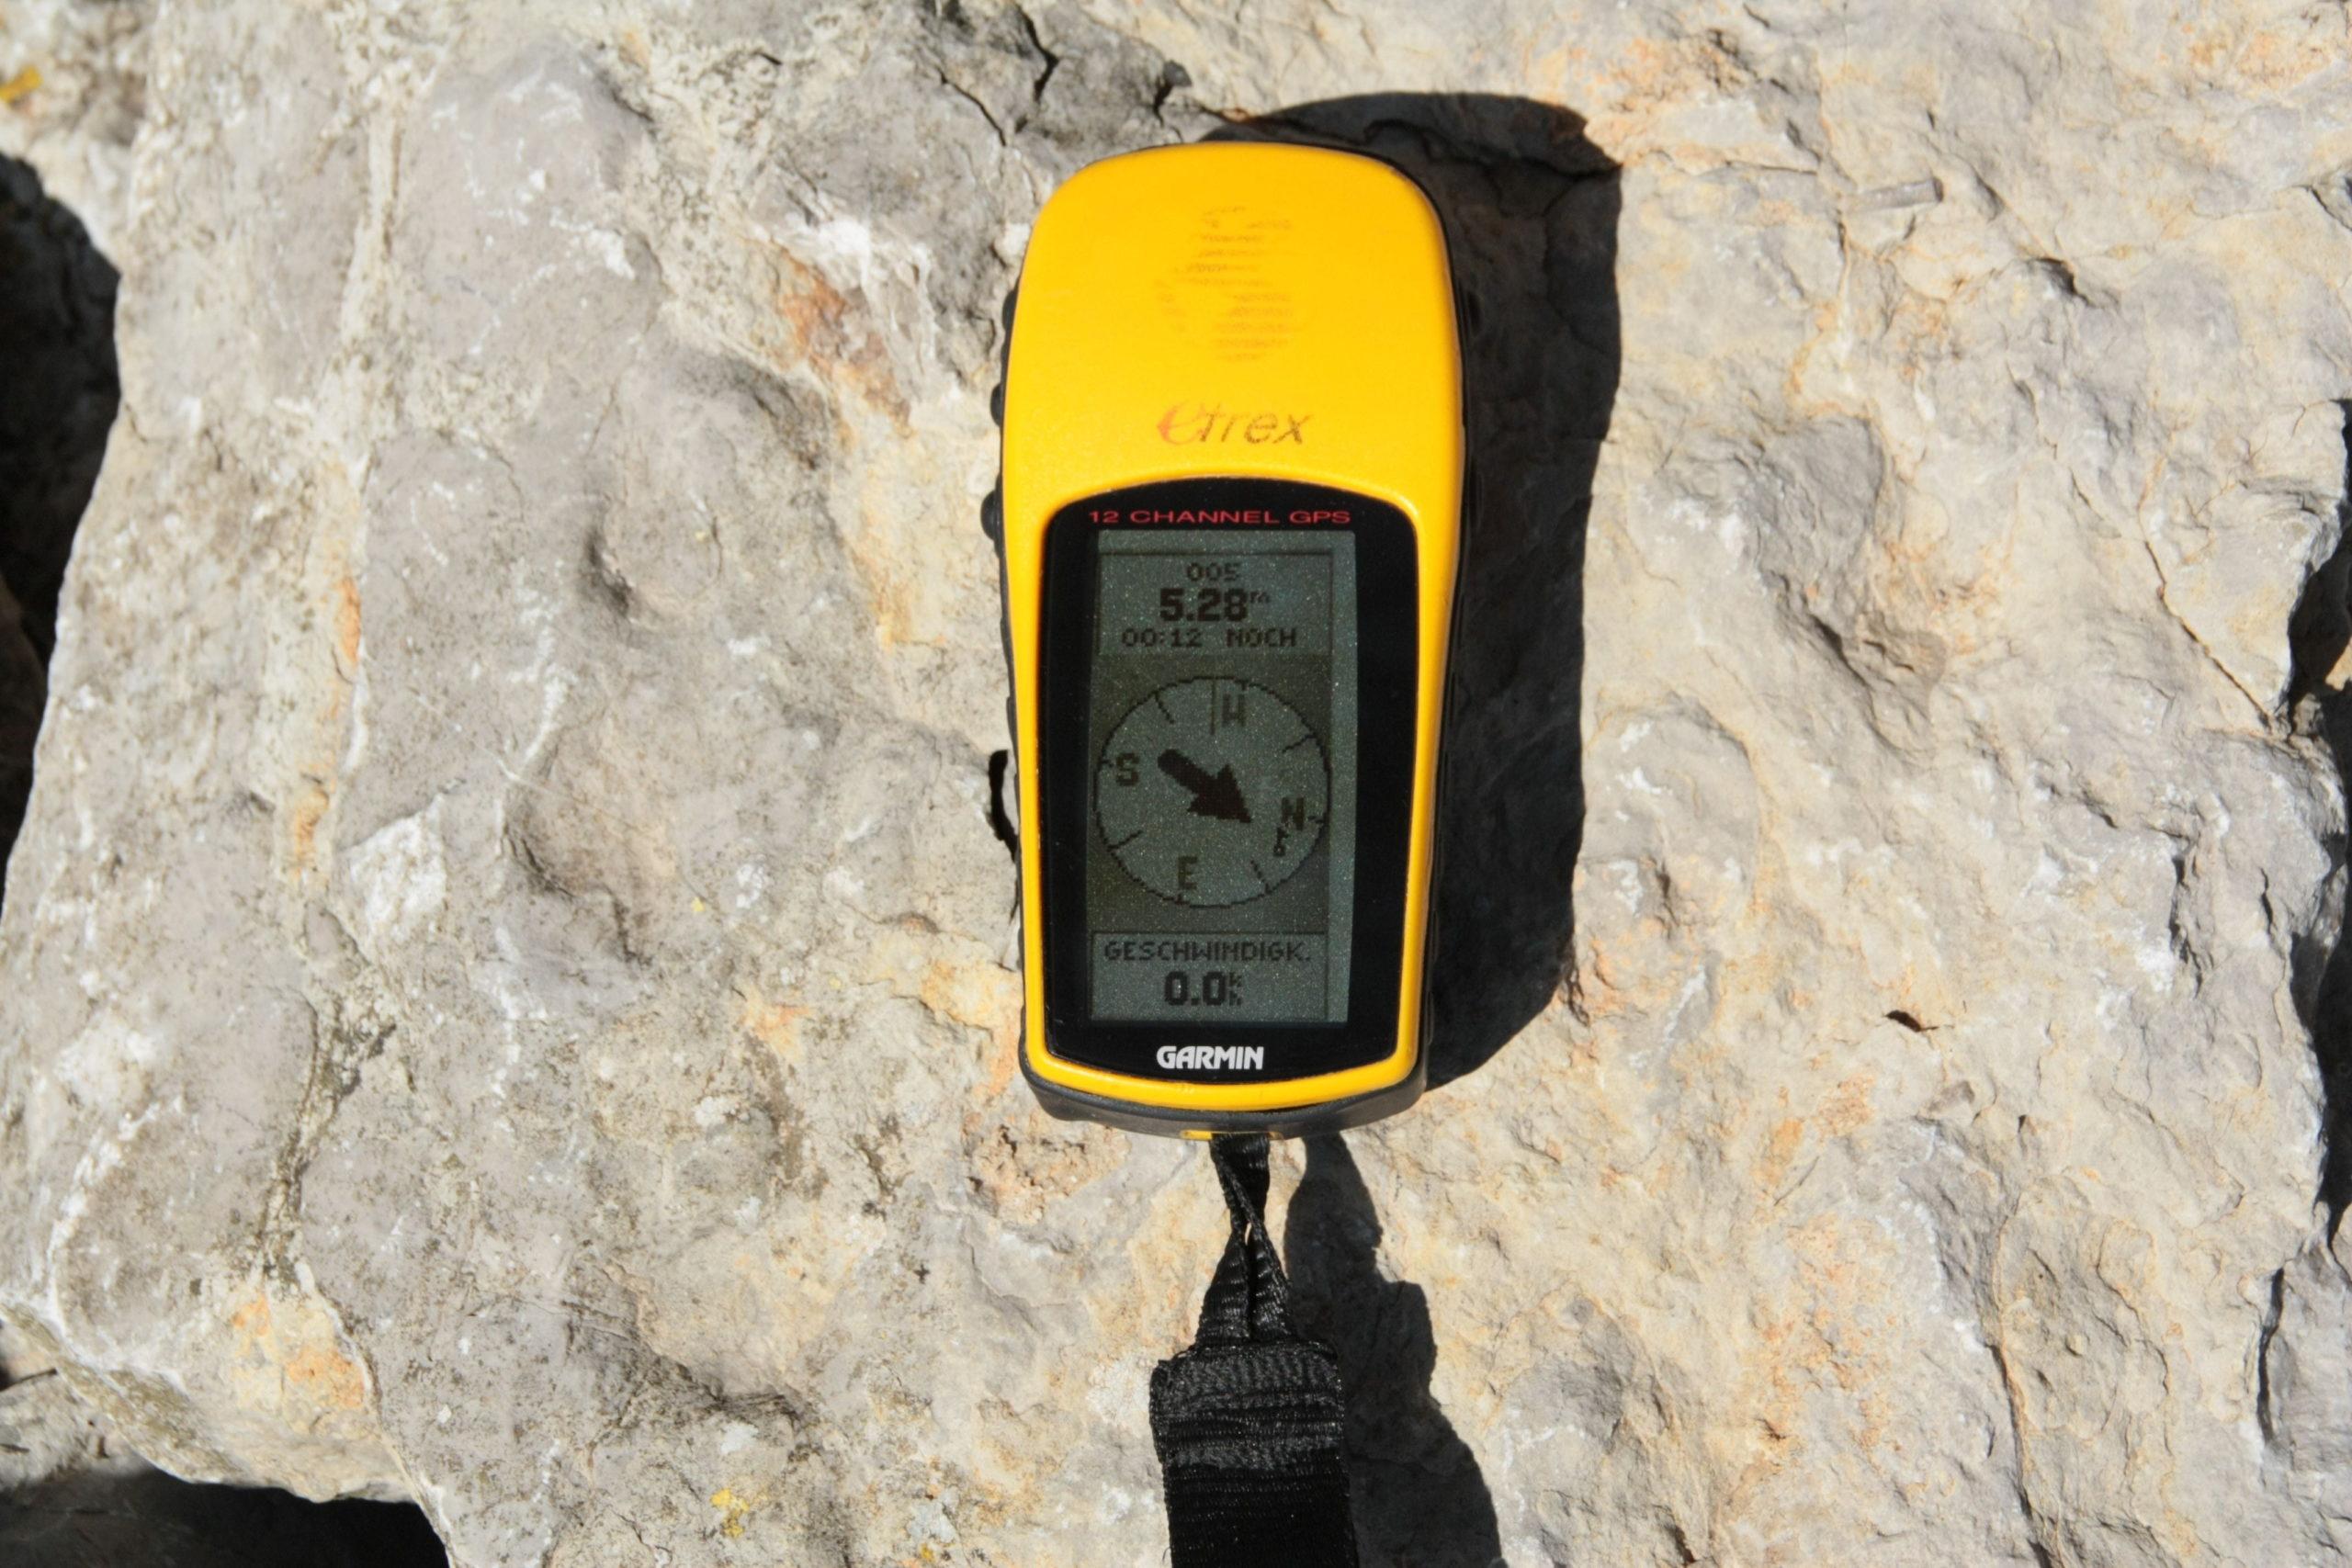 Garmin eTrex 32x Handheld GPS Navigator Review